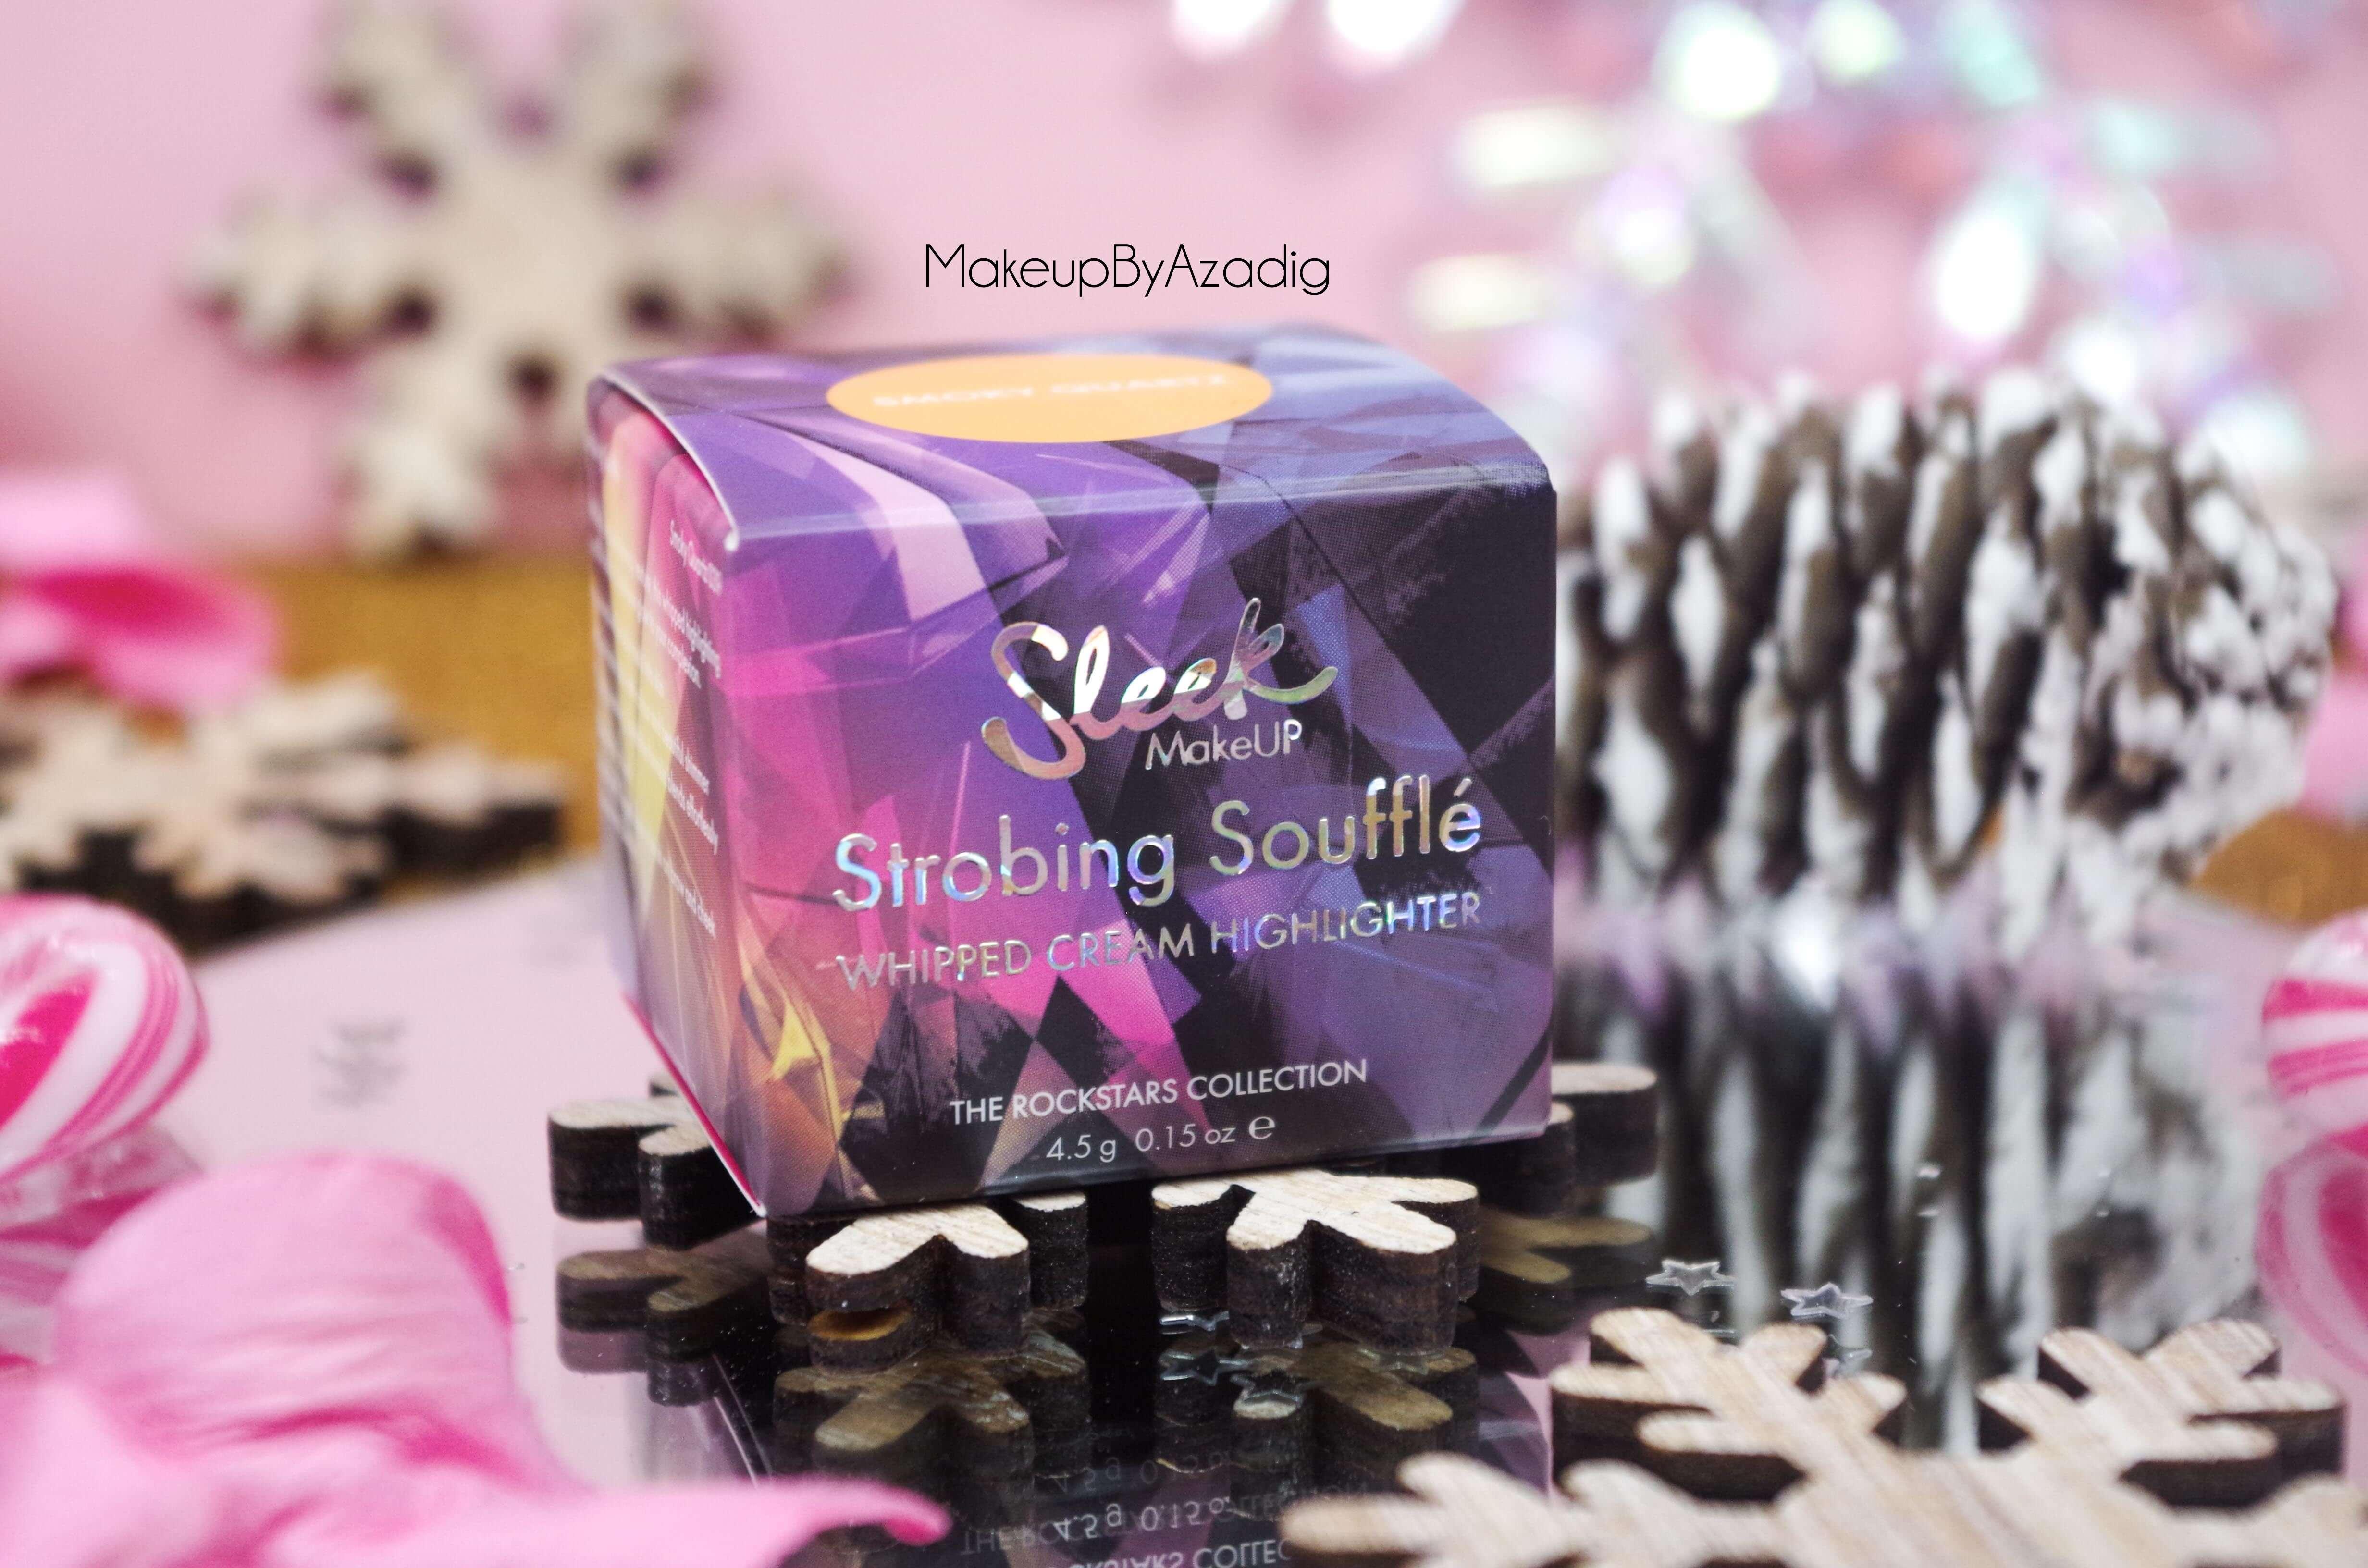 highlighter-sleek-makeup-strobing-souffle-smoky-quartz-sephora-swatch-makeupbyazadig-avis-review